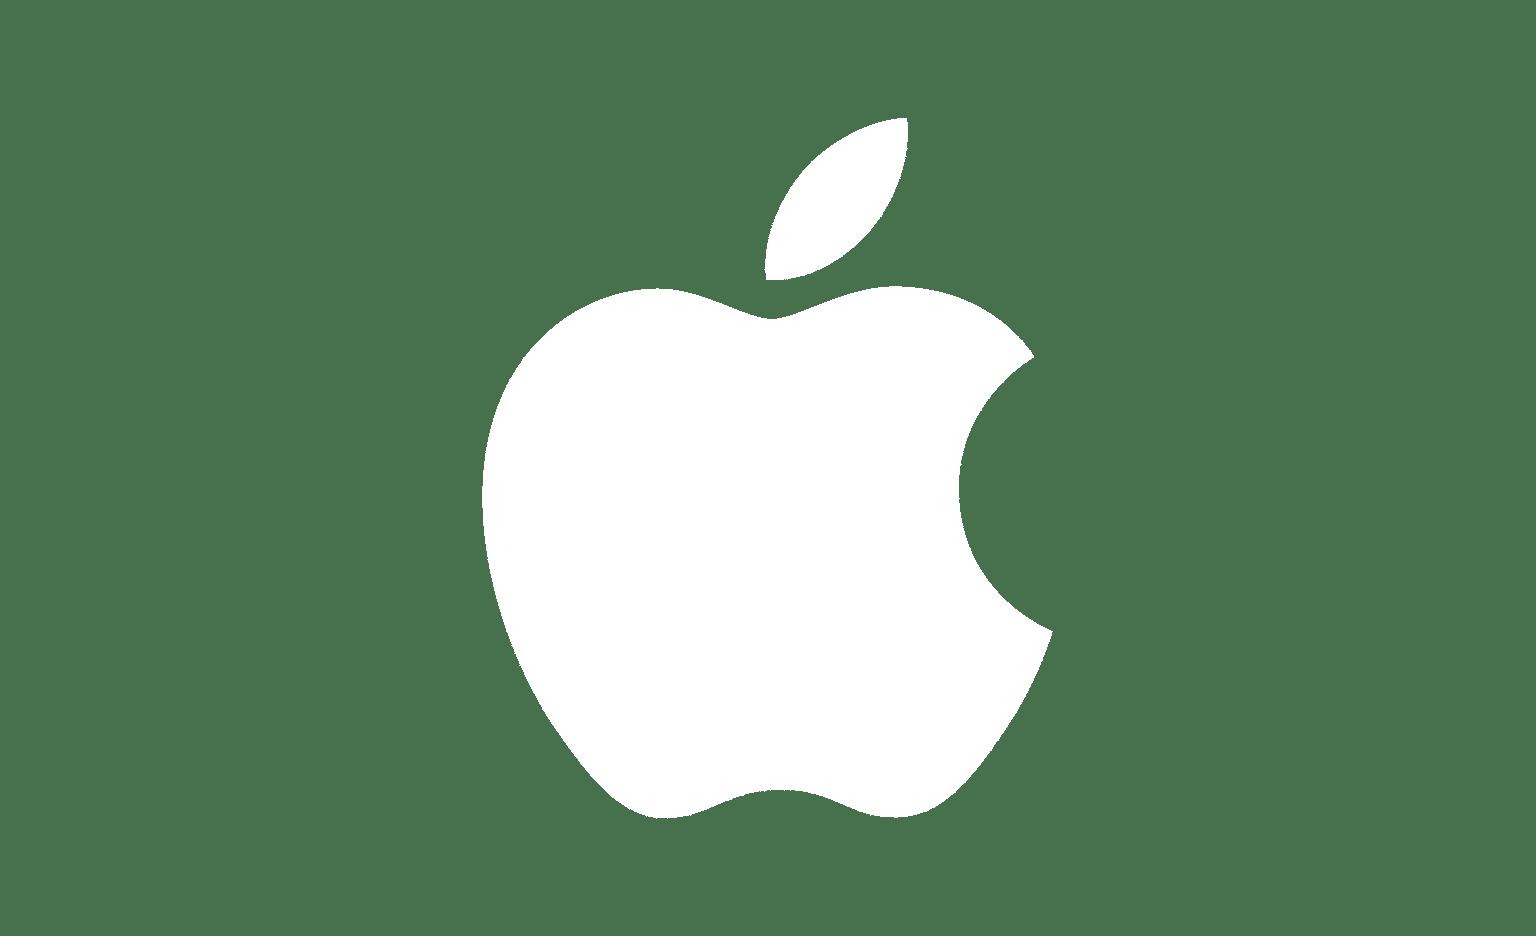 Apple iOS App Development